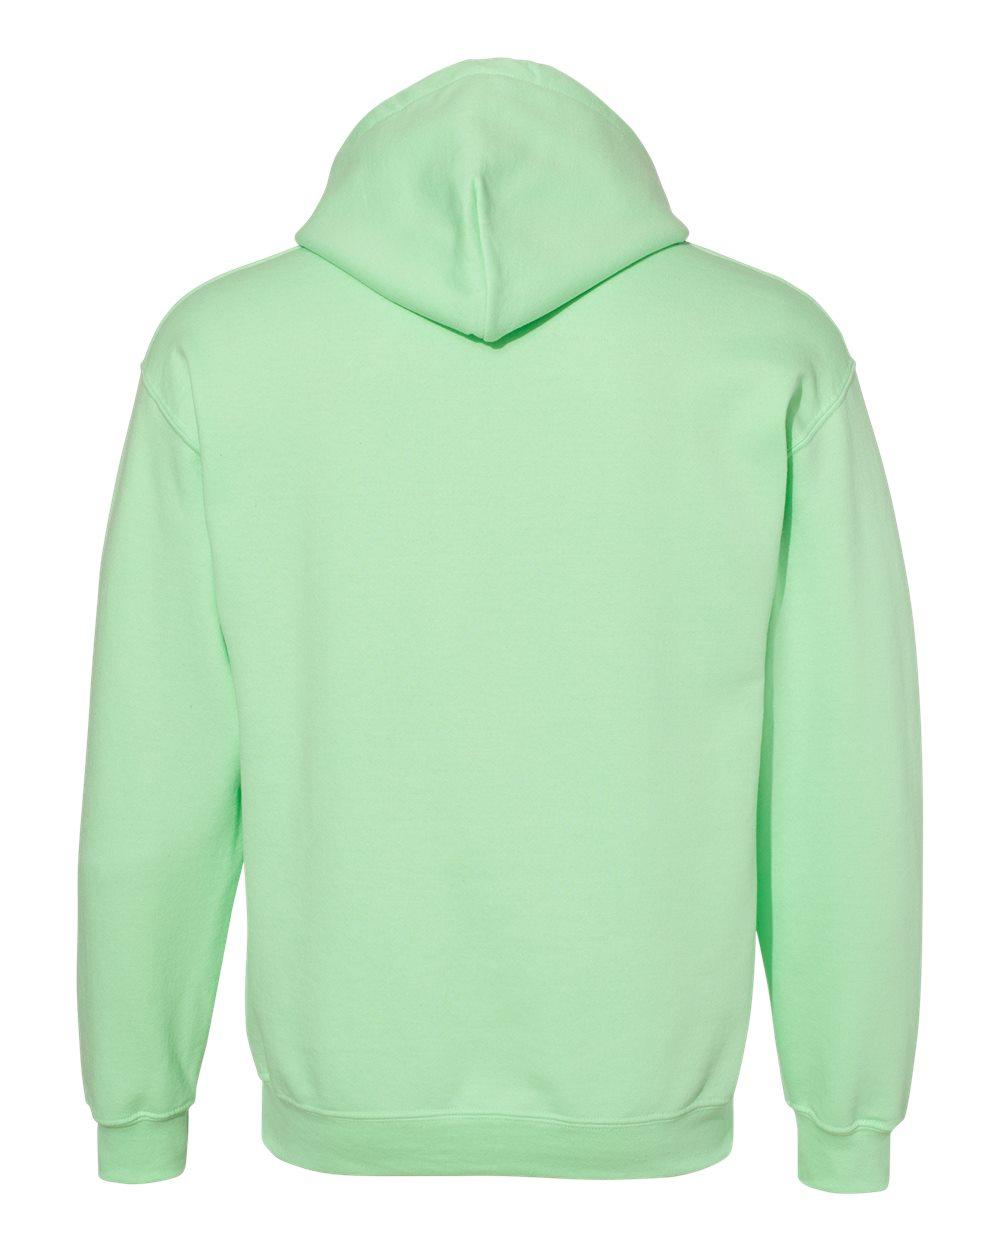 Gildan-Mens-Blank-Hoodie-Heavy-Blend-Hooded-Sweatshirt-Solid-18500-up-to-5XL thumbnail 63